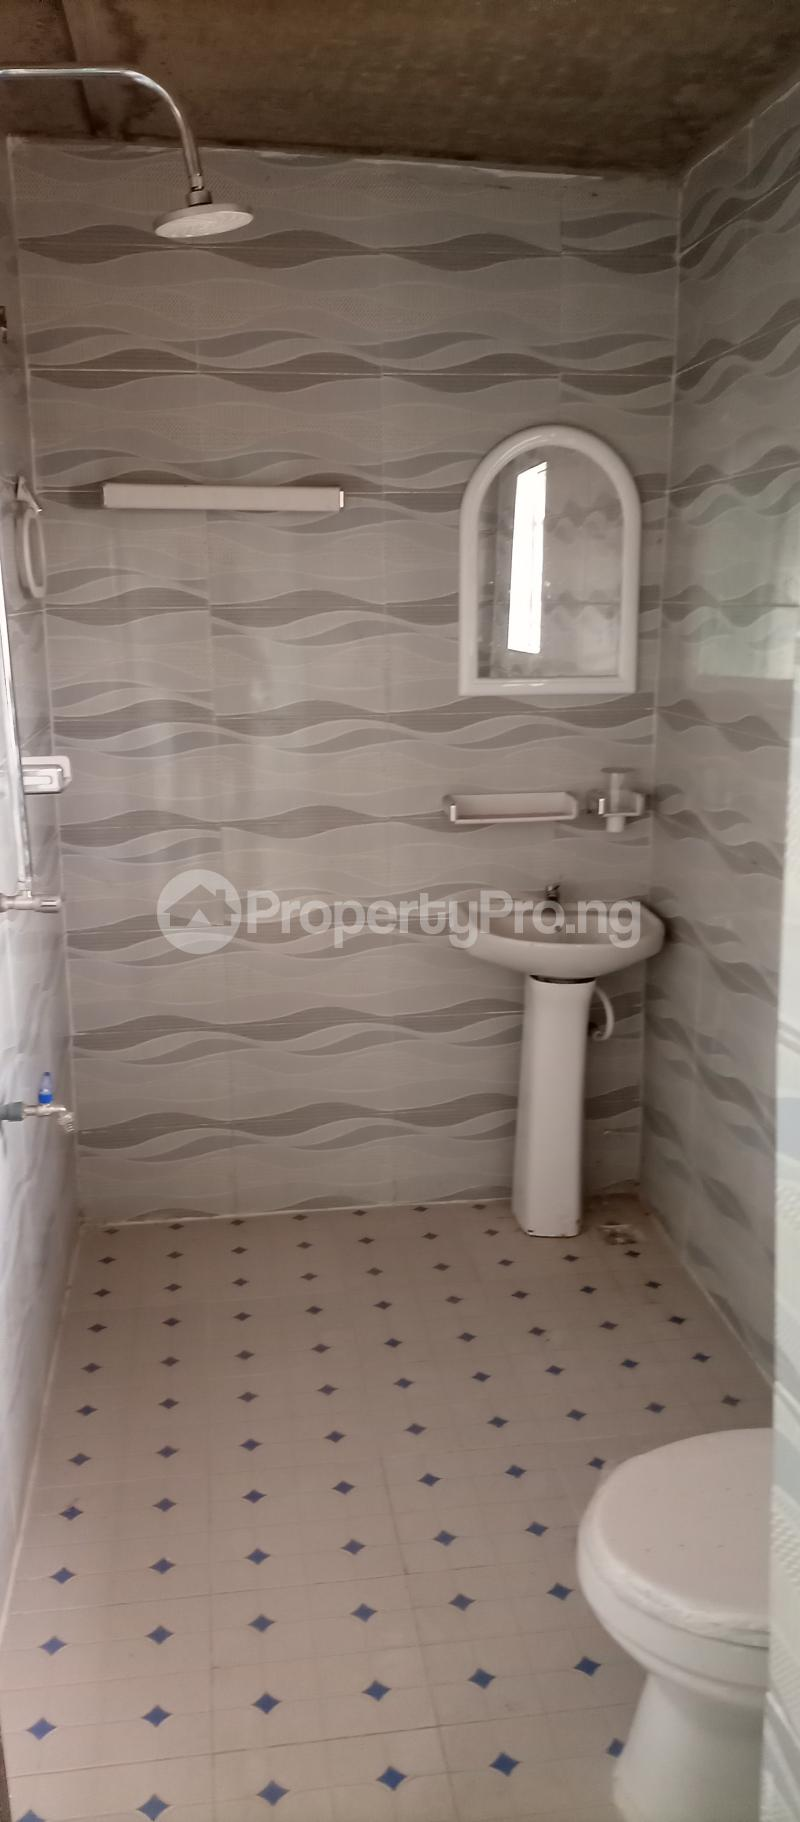 3 bedroom Flat / Apartment for rent Tekobo, Idi Aba Abeokuta Ogun State Idi Aba Abeokuta Ogun - 1